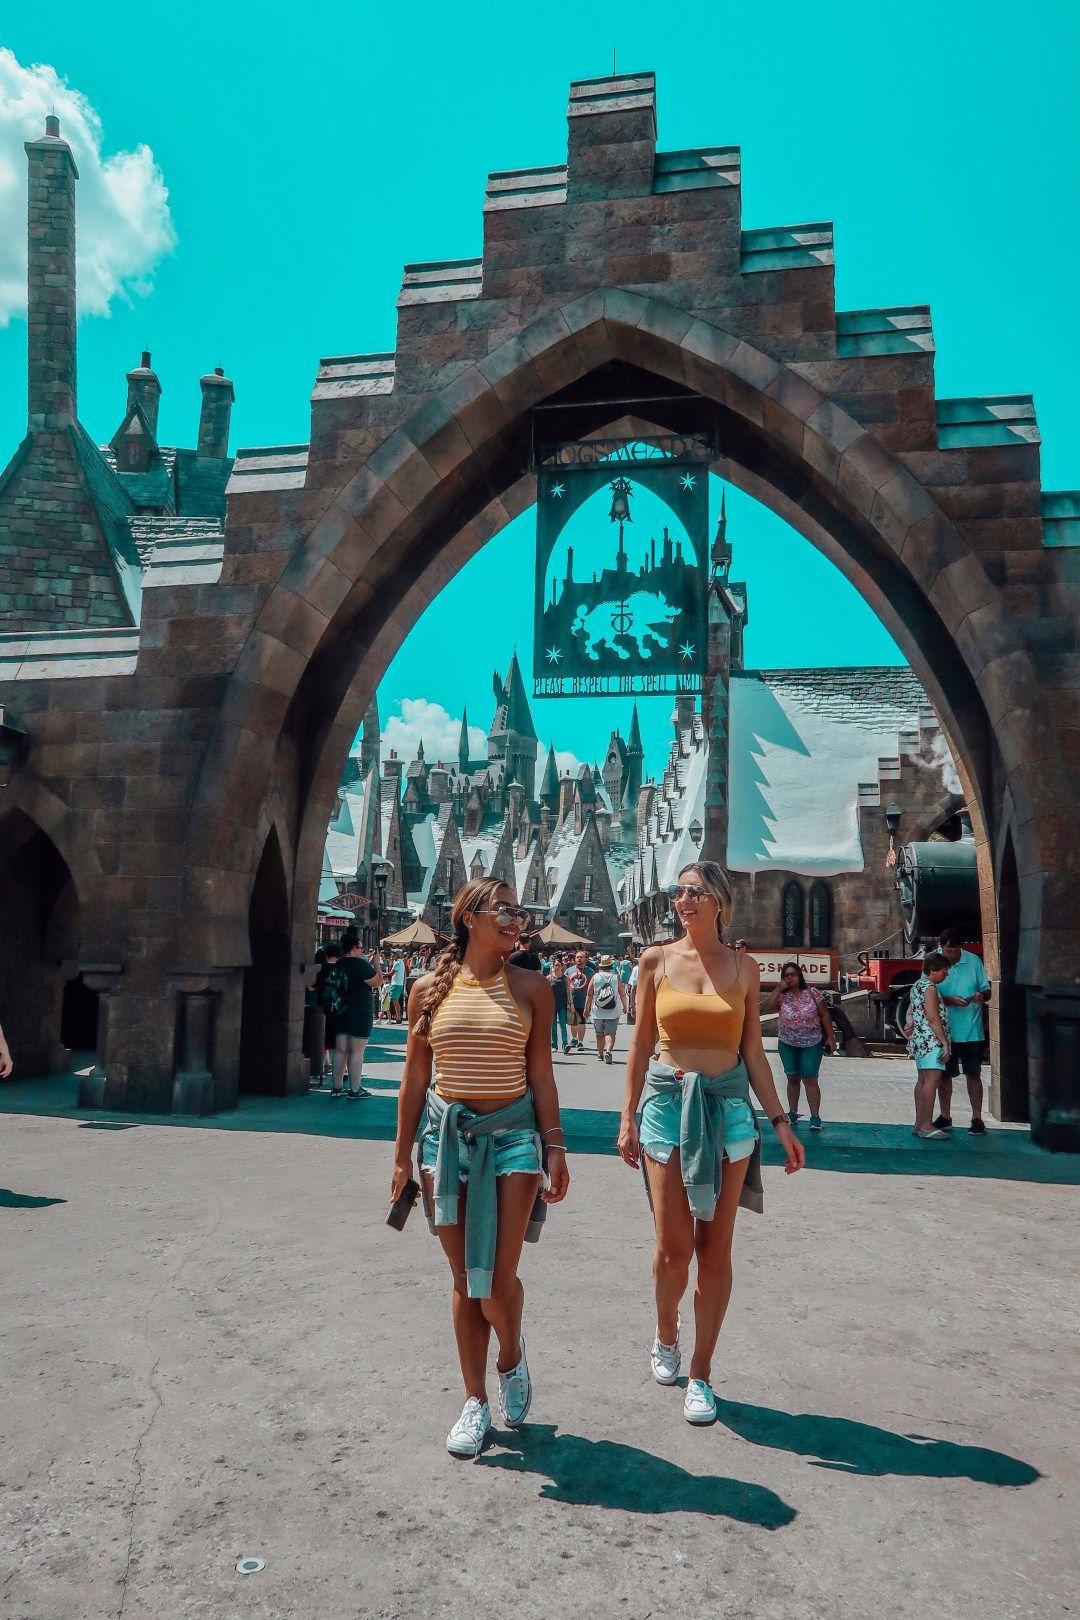 The Muggle S Guide To The Wizarding World Of Harry Potter Harry Potter Universal Studios Universal Studios Orlando Trip Disney Photo Ideas